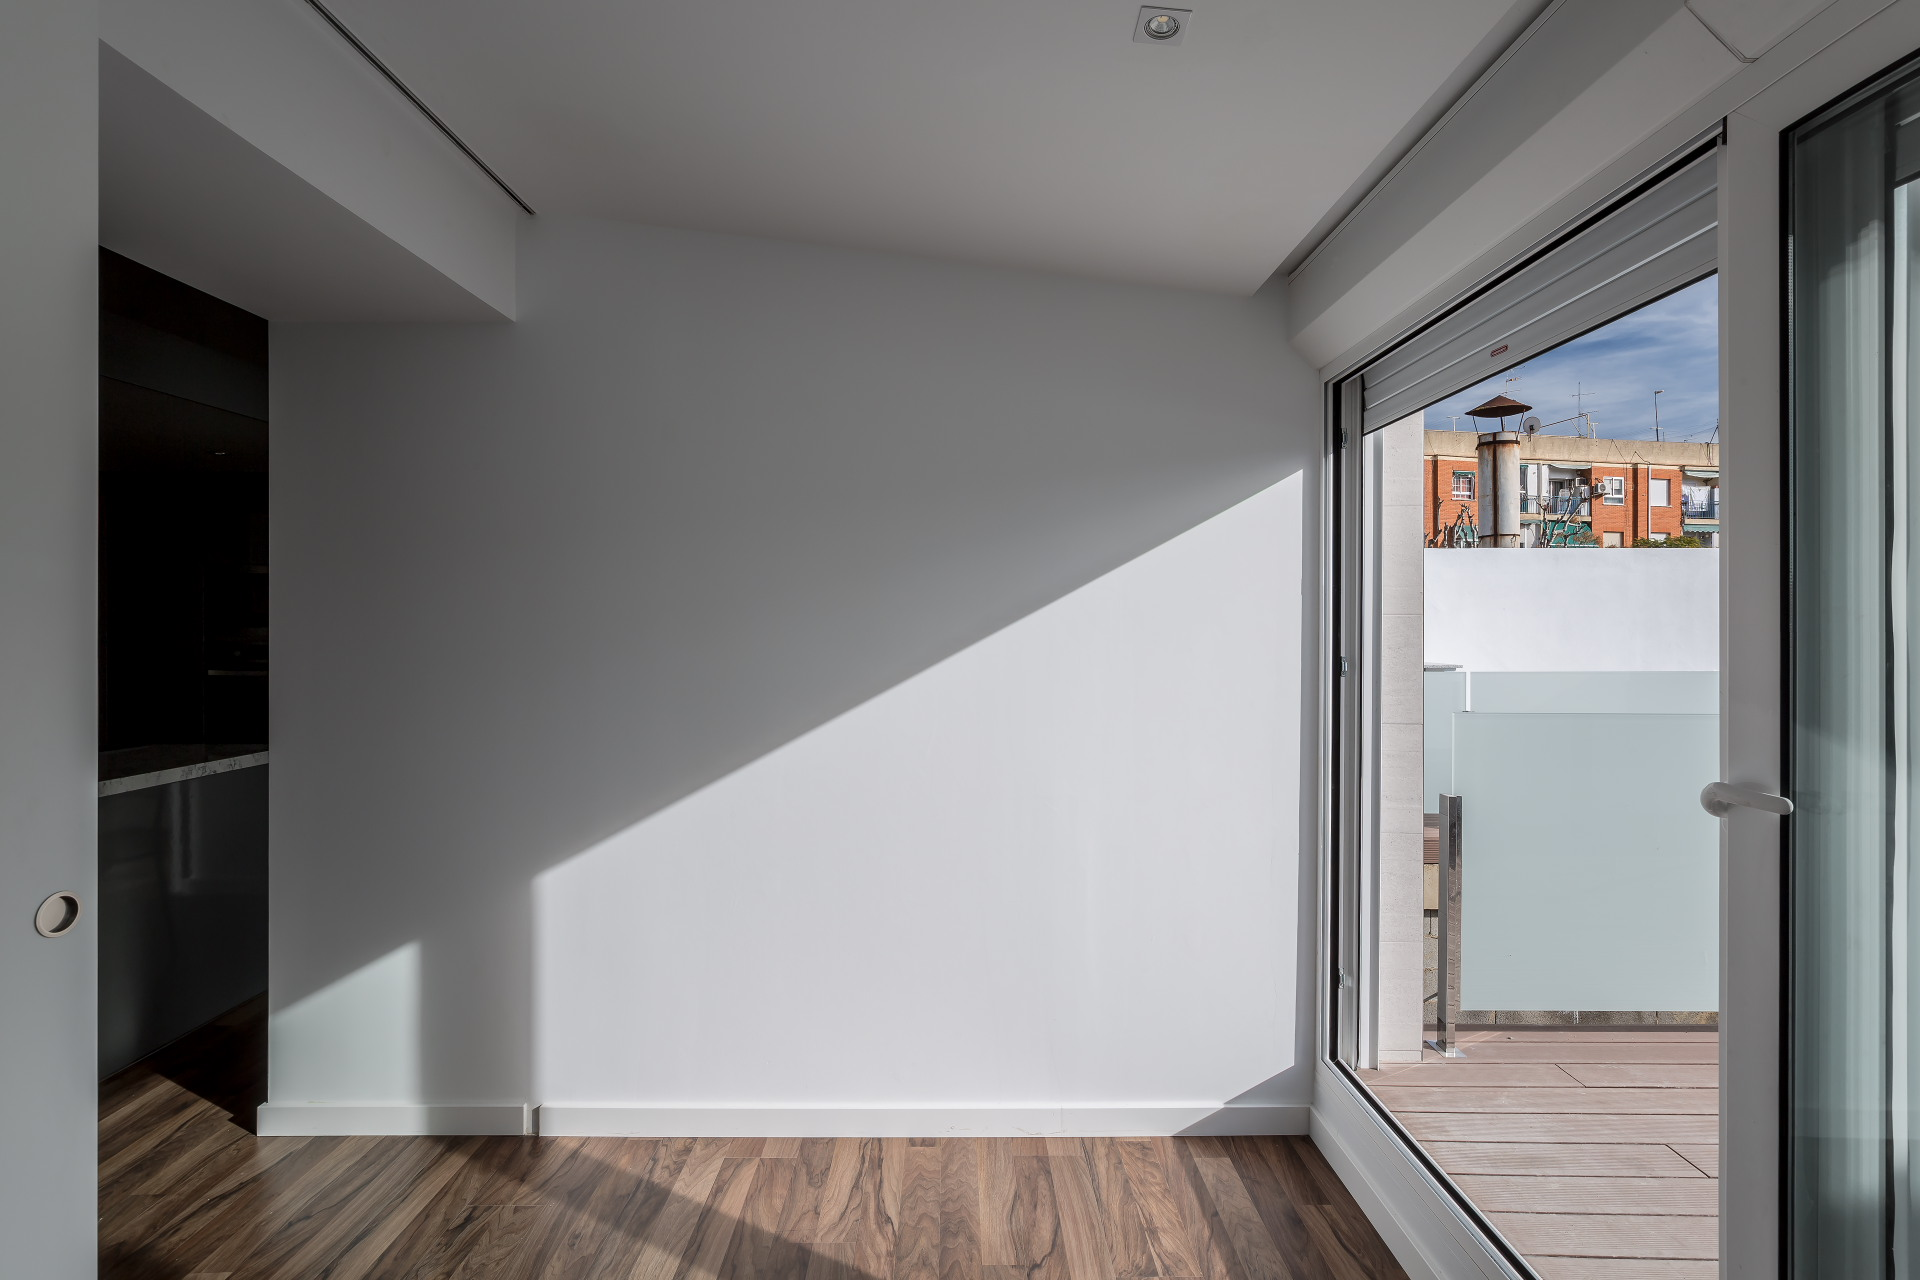 fotografia-arquitectura-valencia-german-cabo-viraje-reforma-campanar (14)